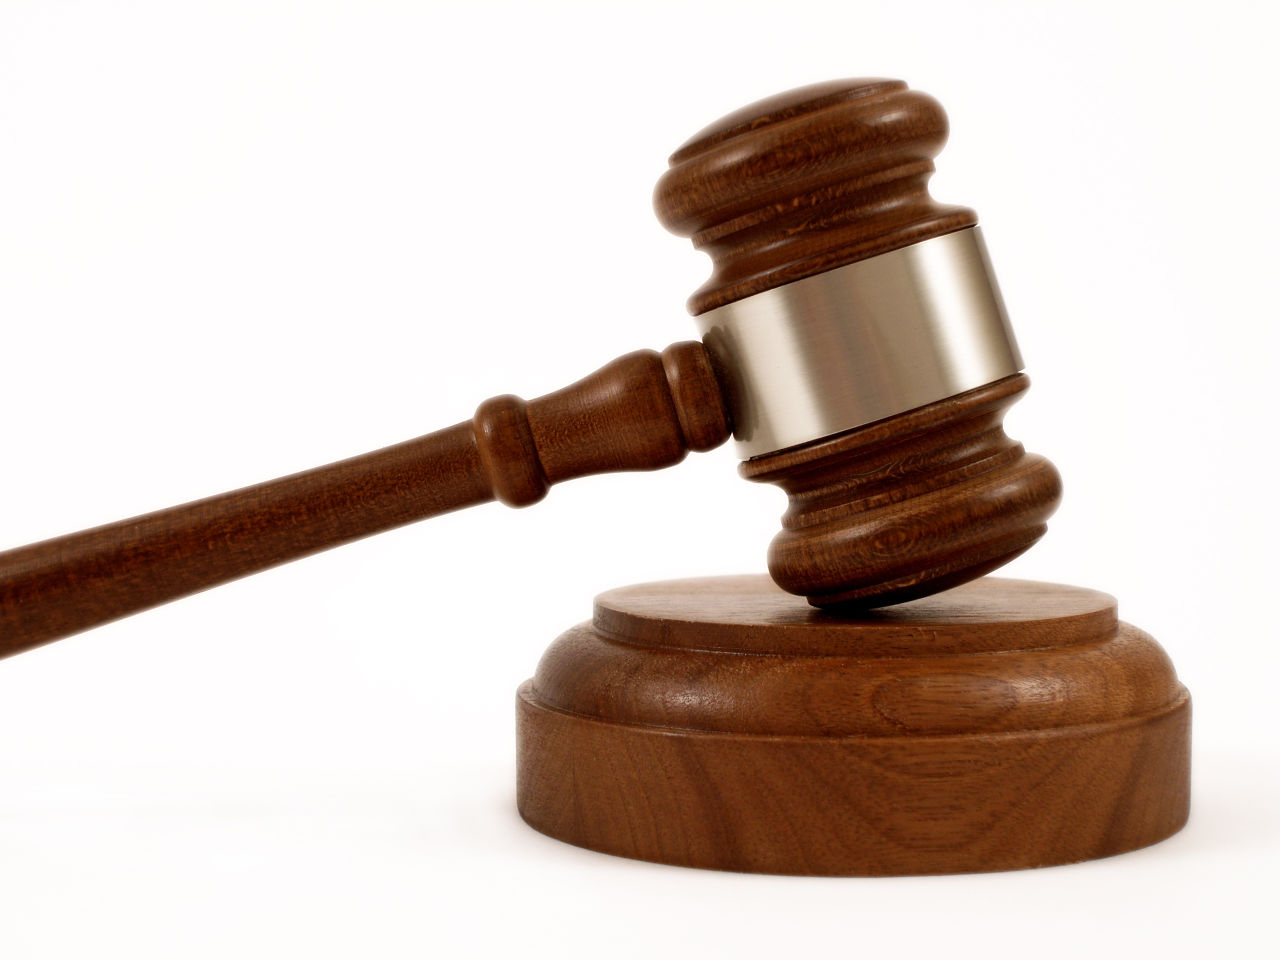 1280x960 Monroe Attorney's Recusal Tactics Draw Judges' Criticism Local